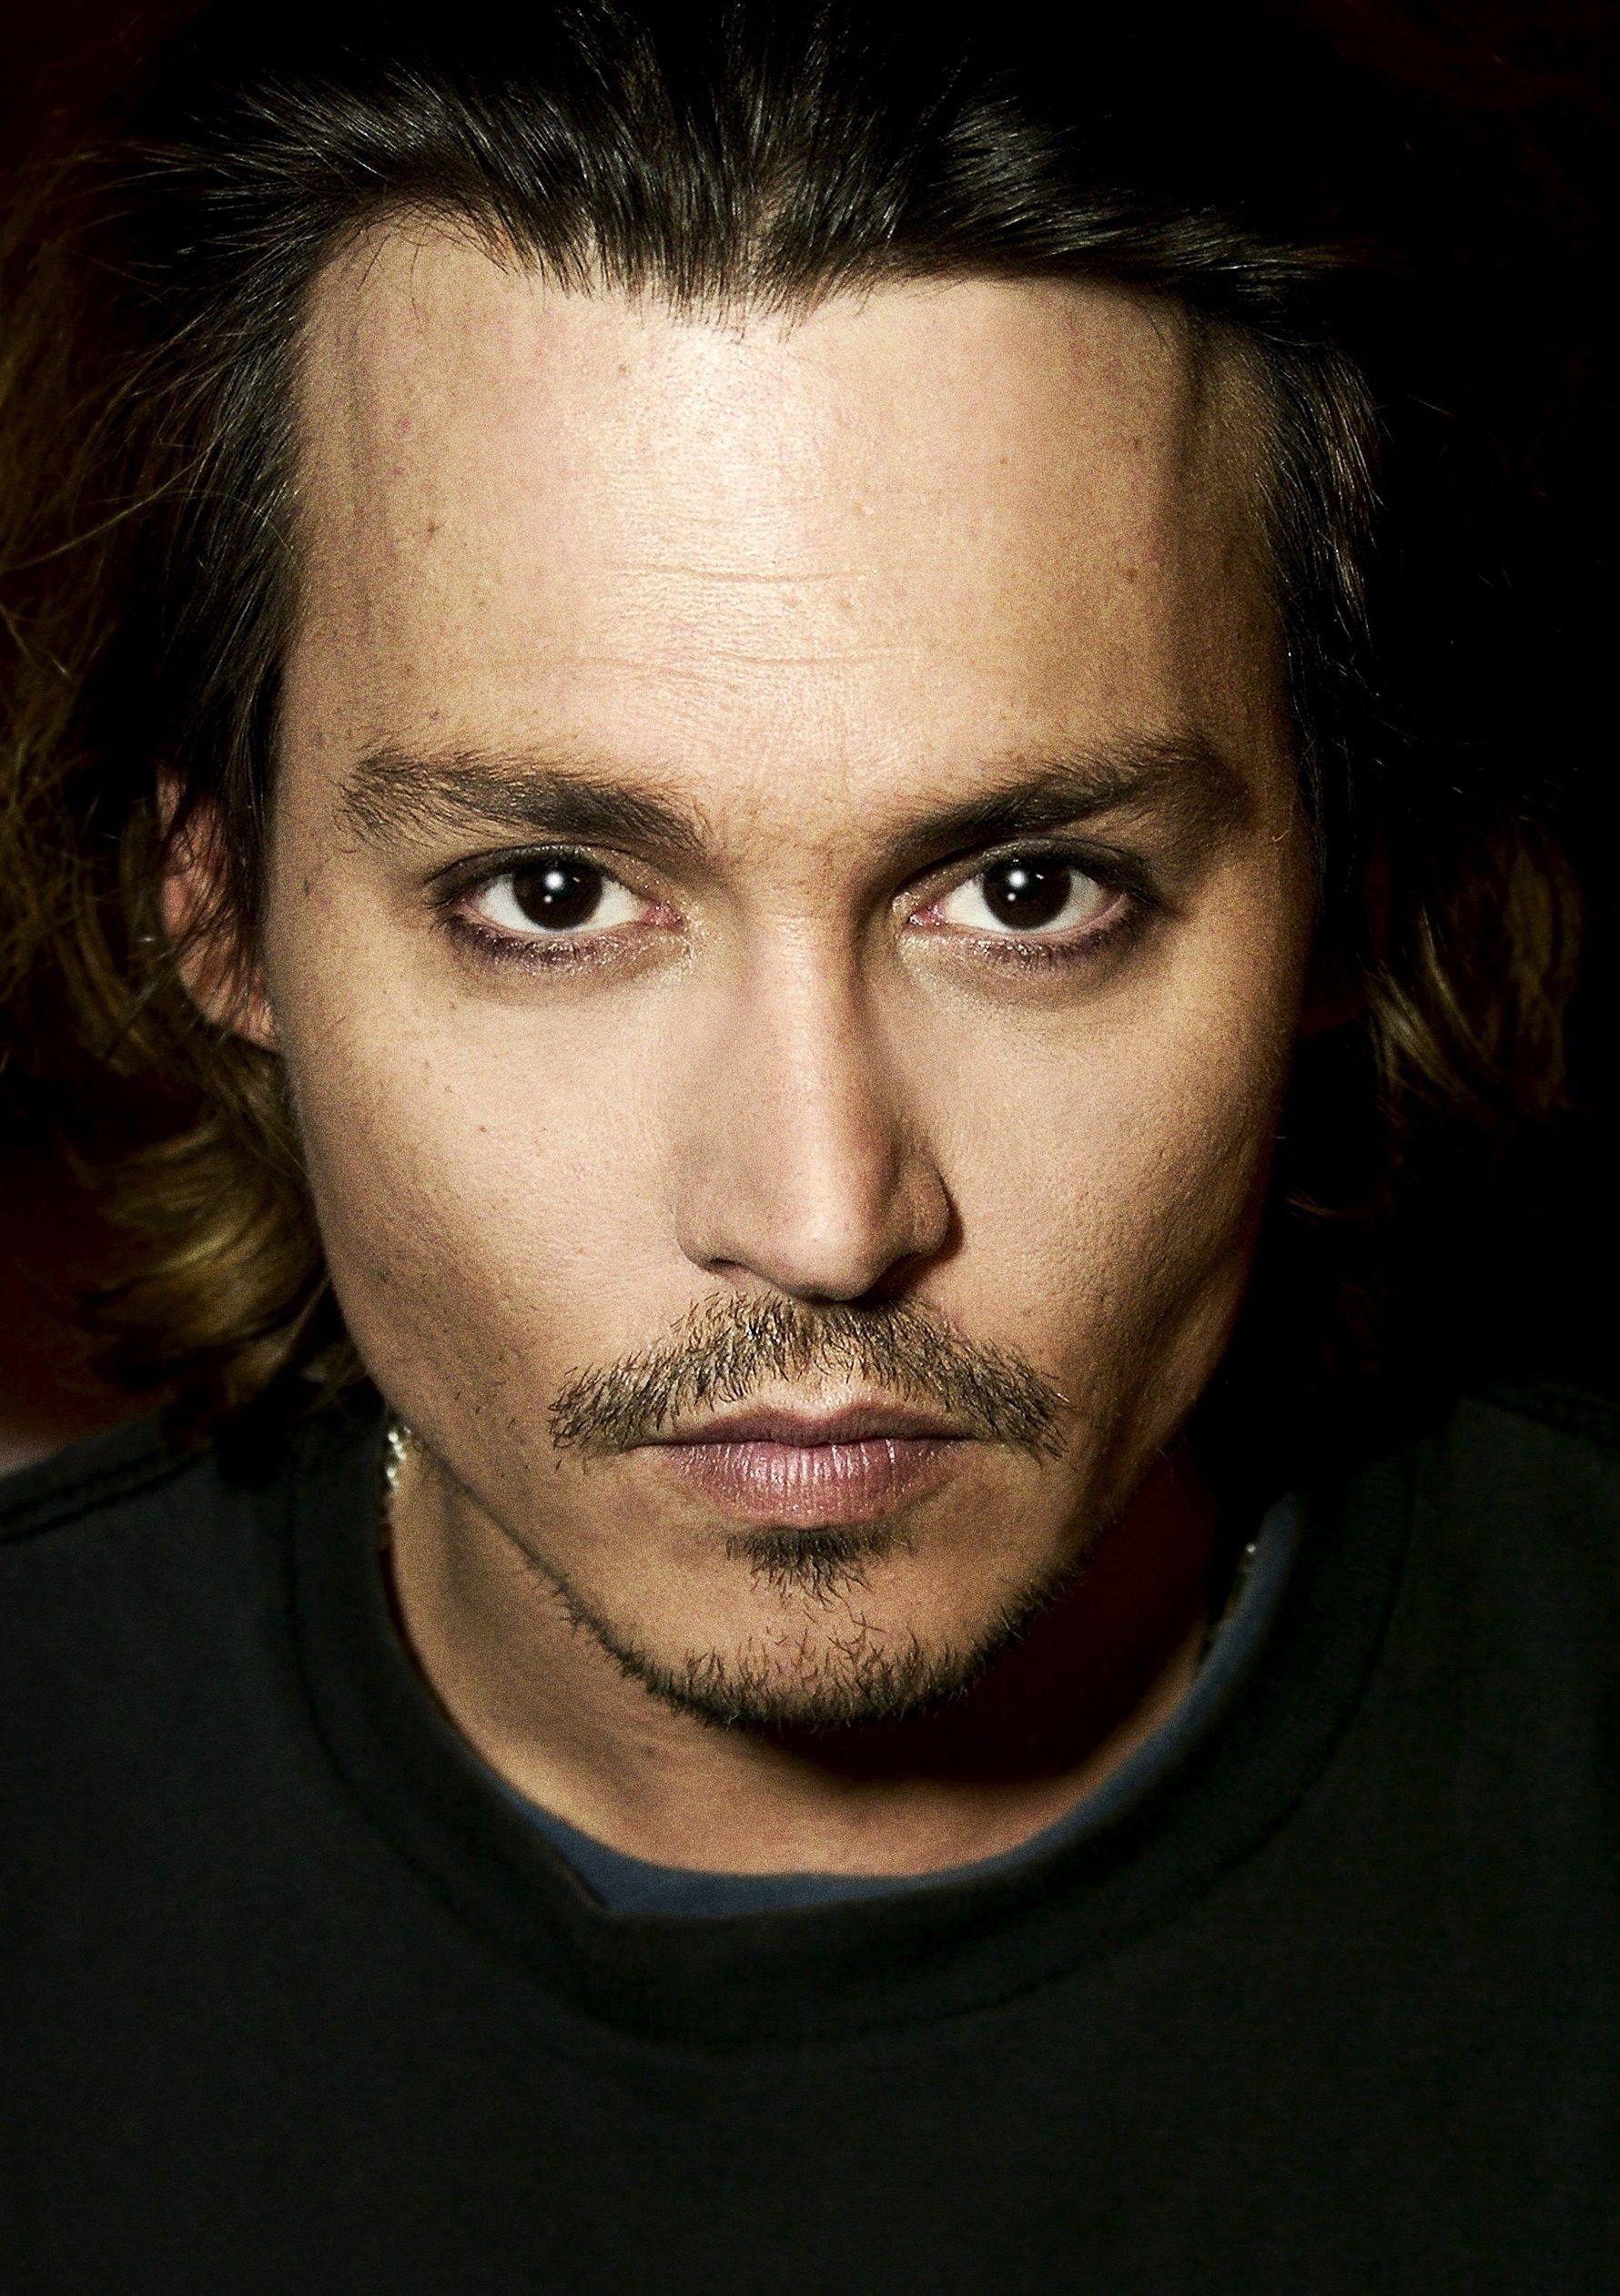 Johnny Depp Resist Eye And Jawline Art Candy